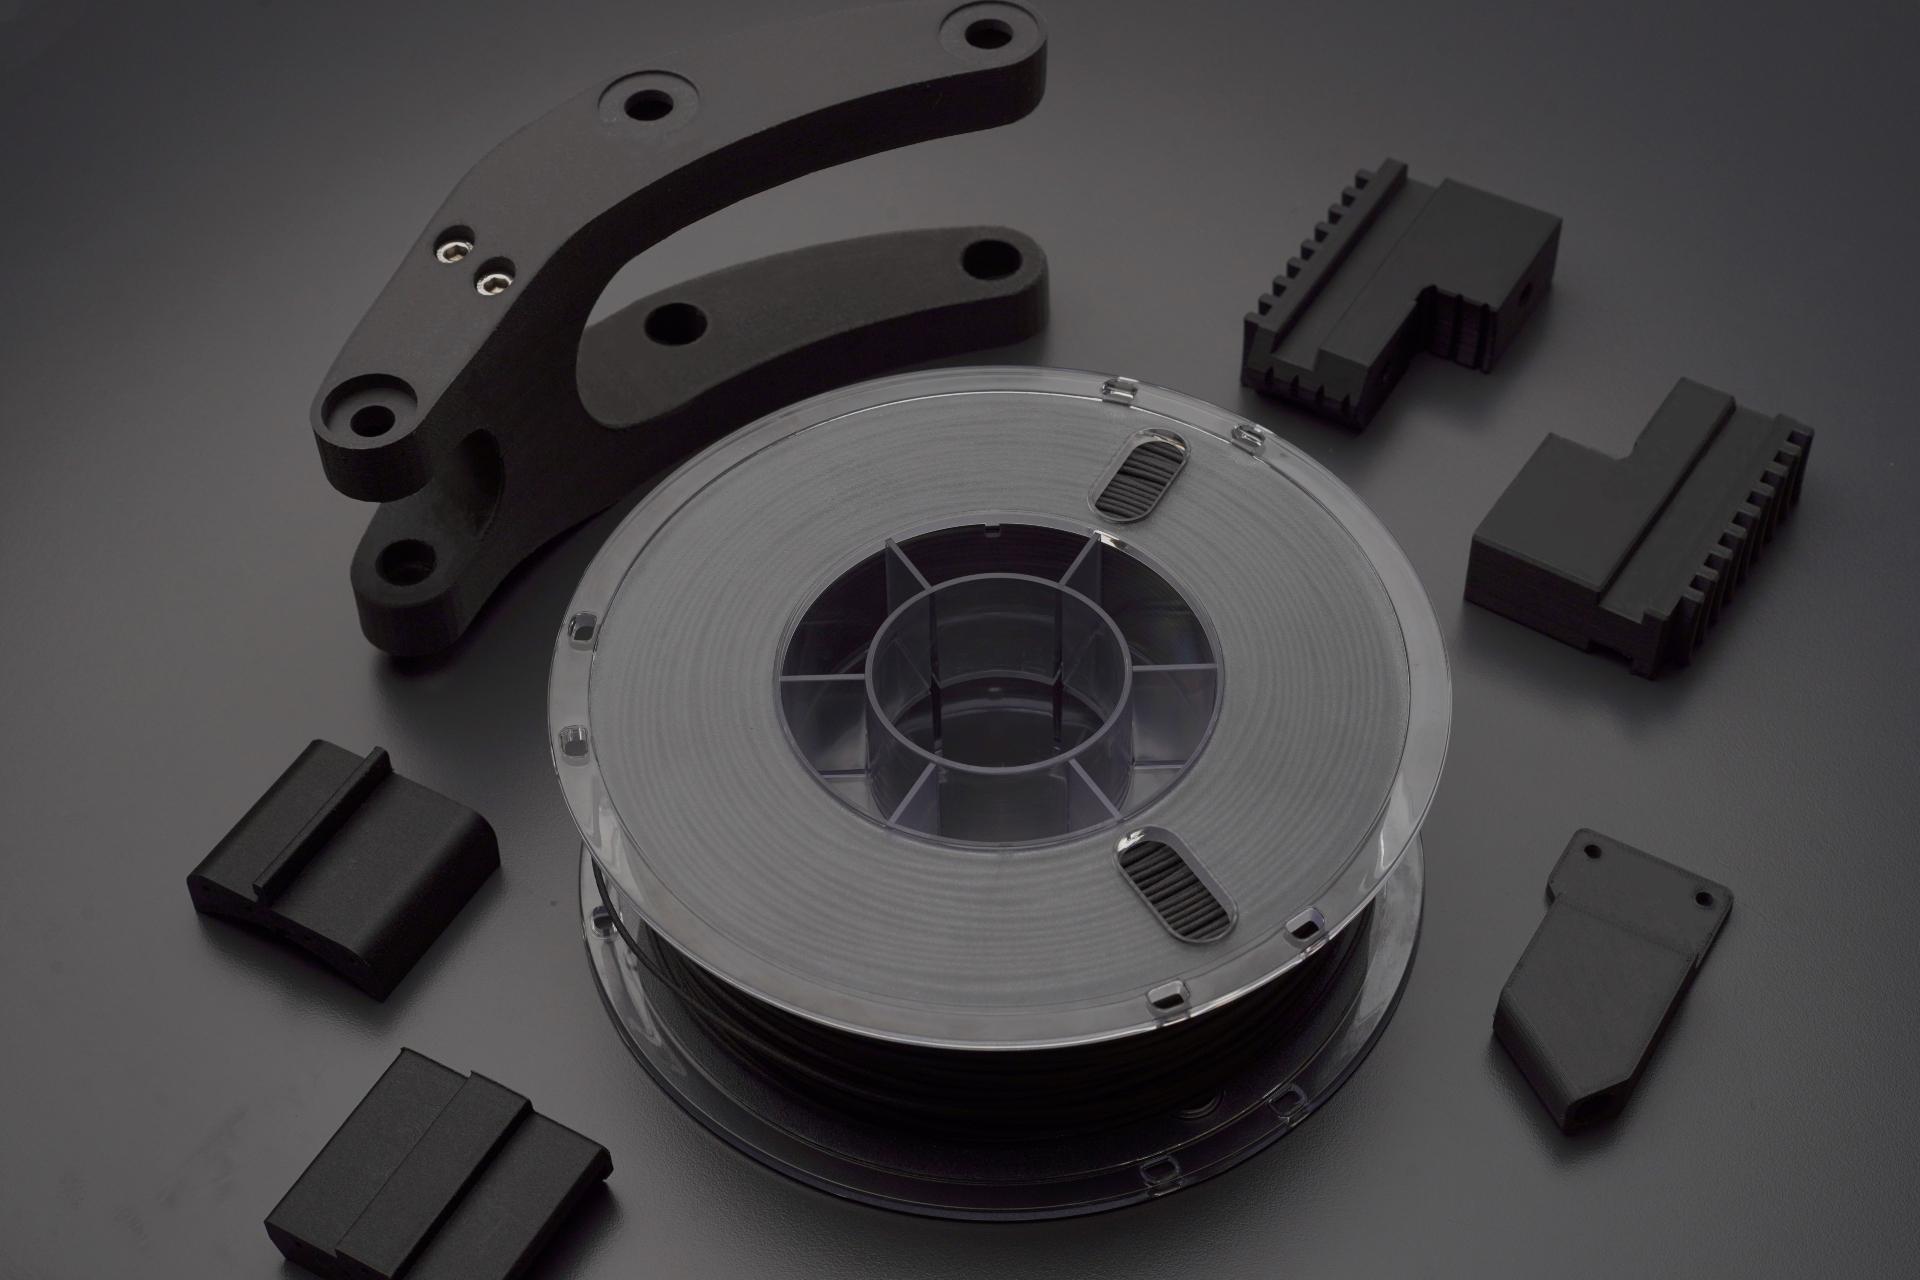 Polymaker's Smooth PA filament. Photo via Anisoprint.